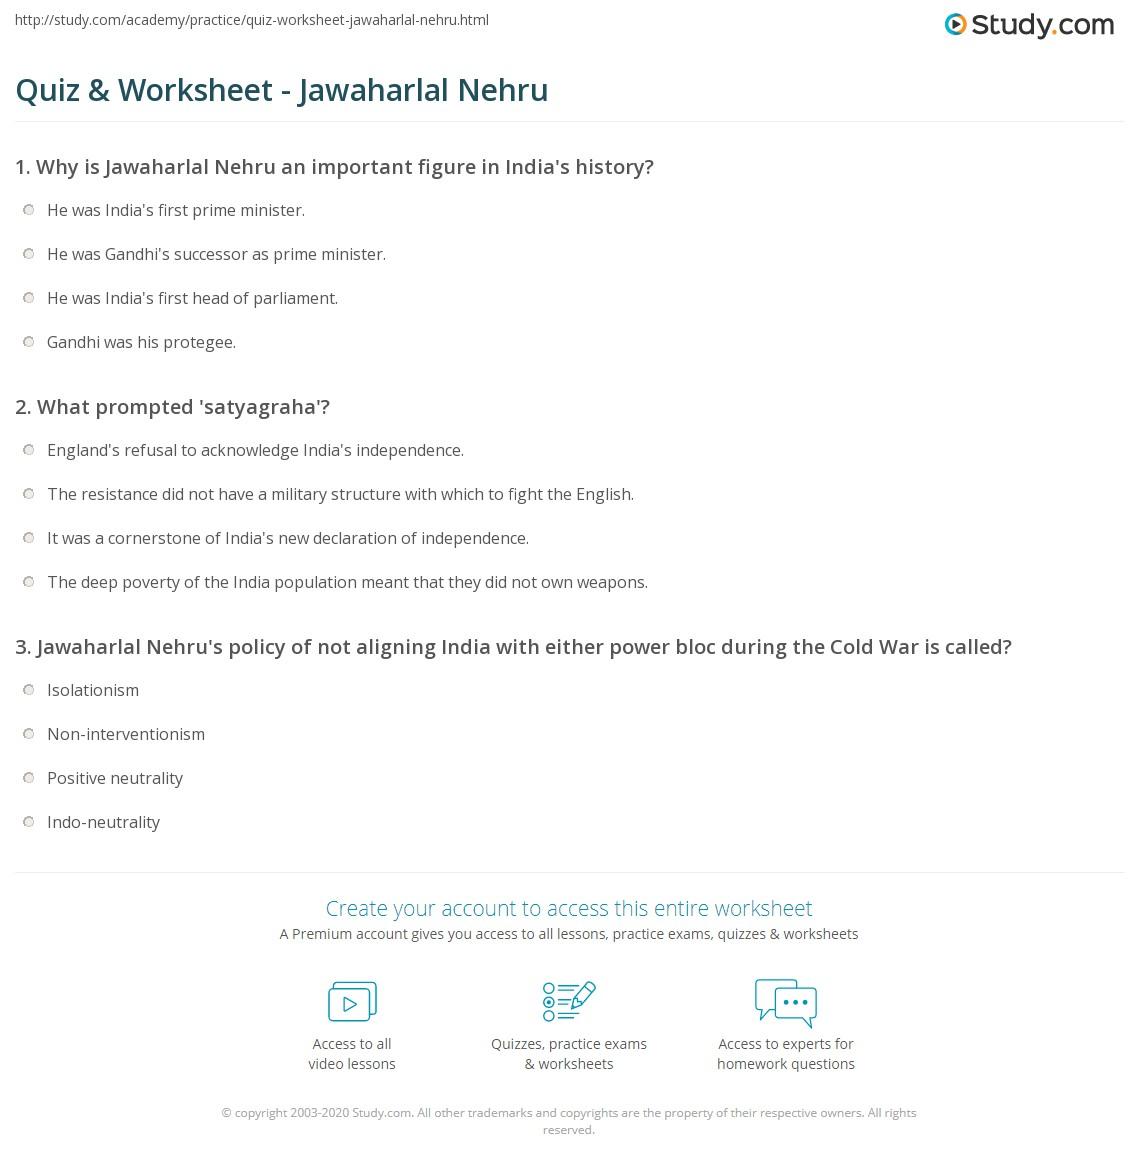 https://study.com/academy/practice/quiz-worksheet-jawaharlal-nehru.jpg